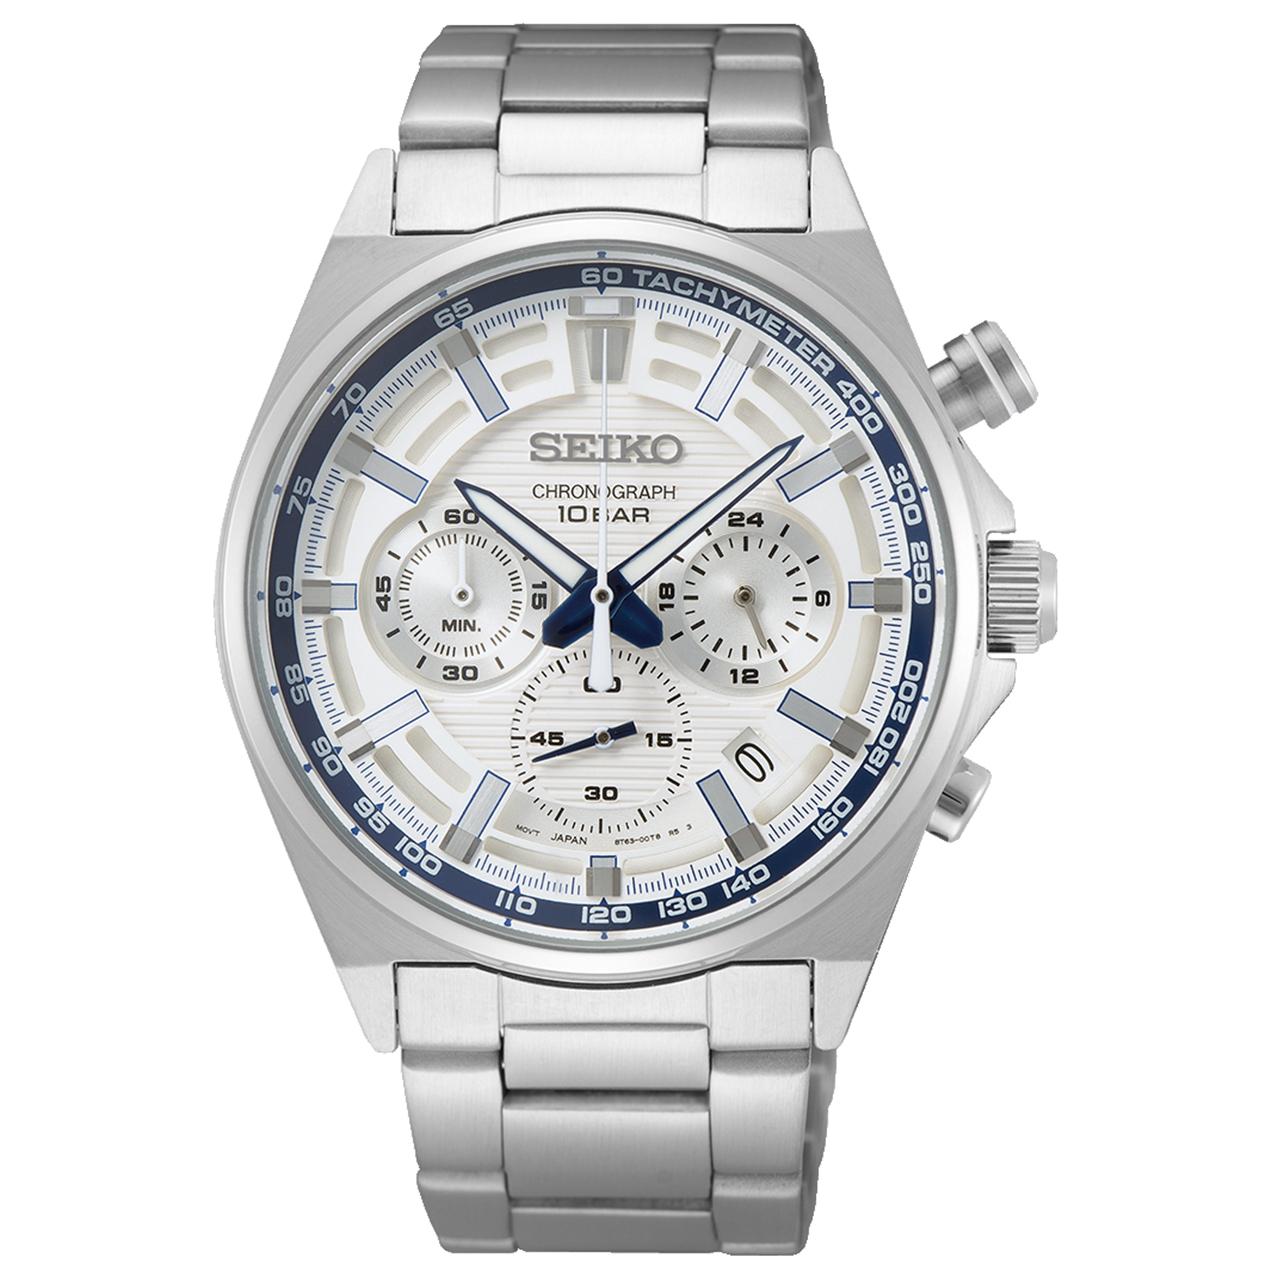 Seiko SSB395P1 Chronograph Sports Watch